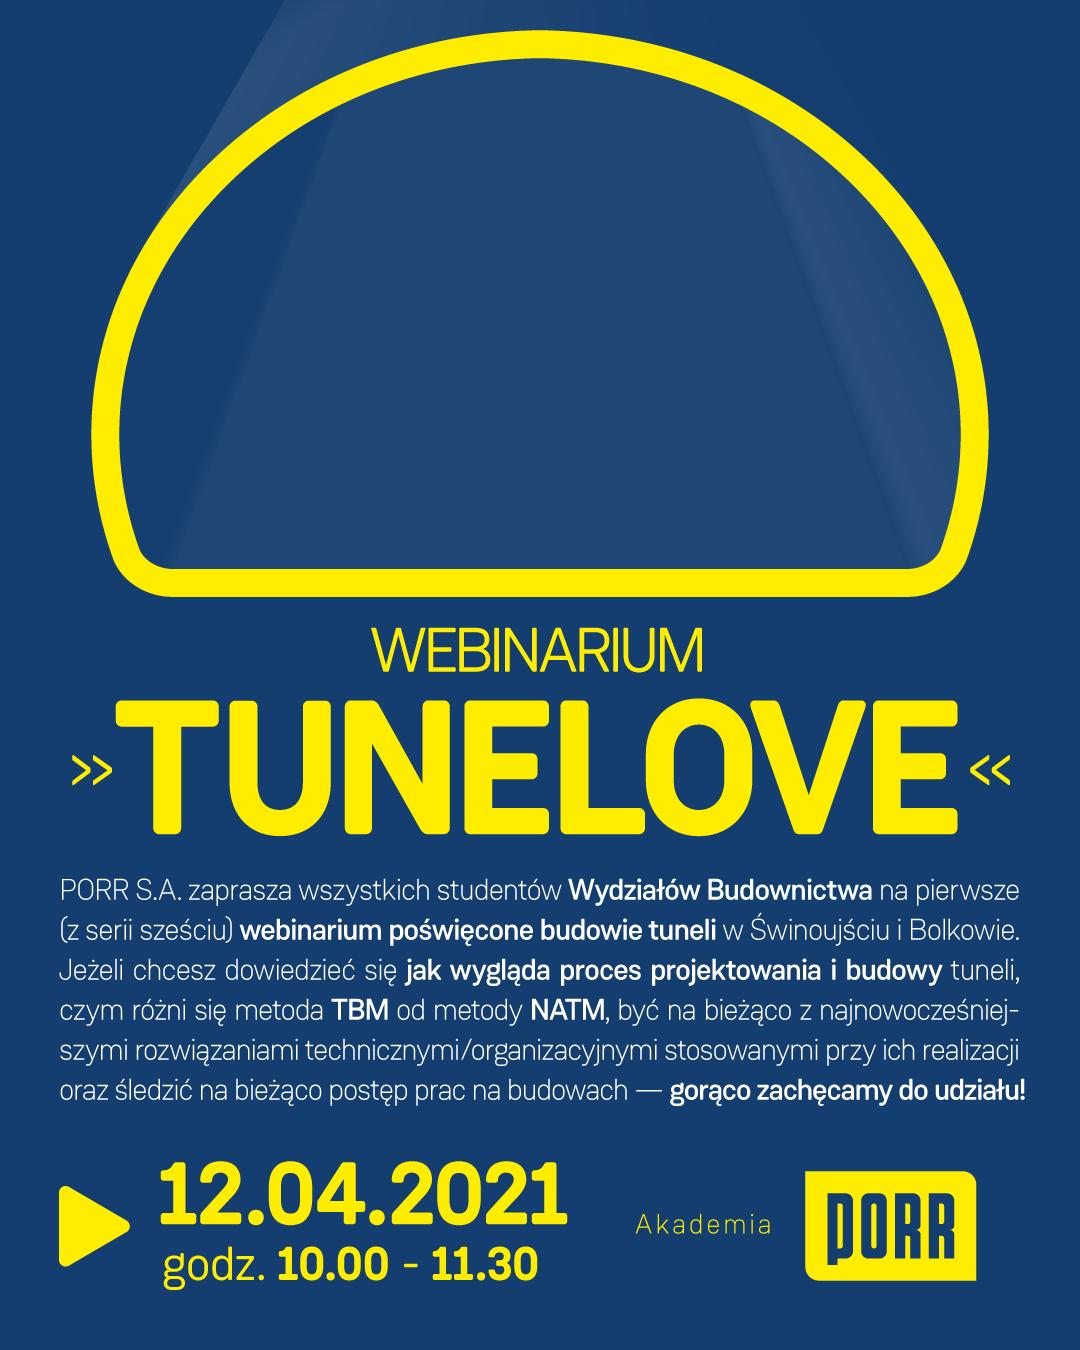 Webinarium: TUNELOVE